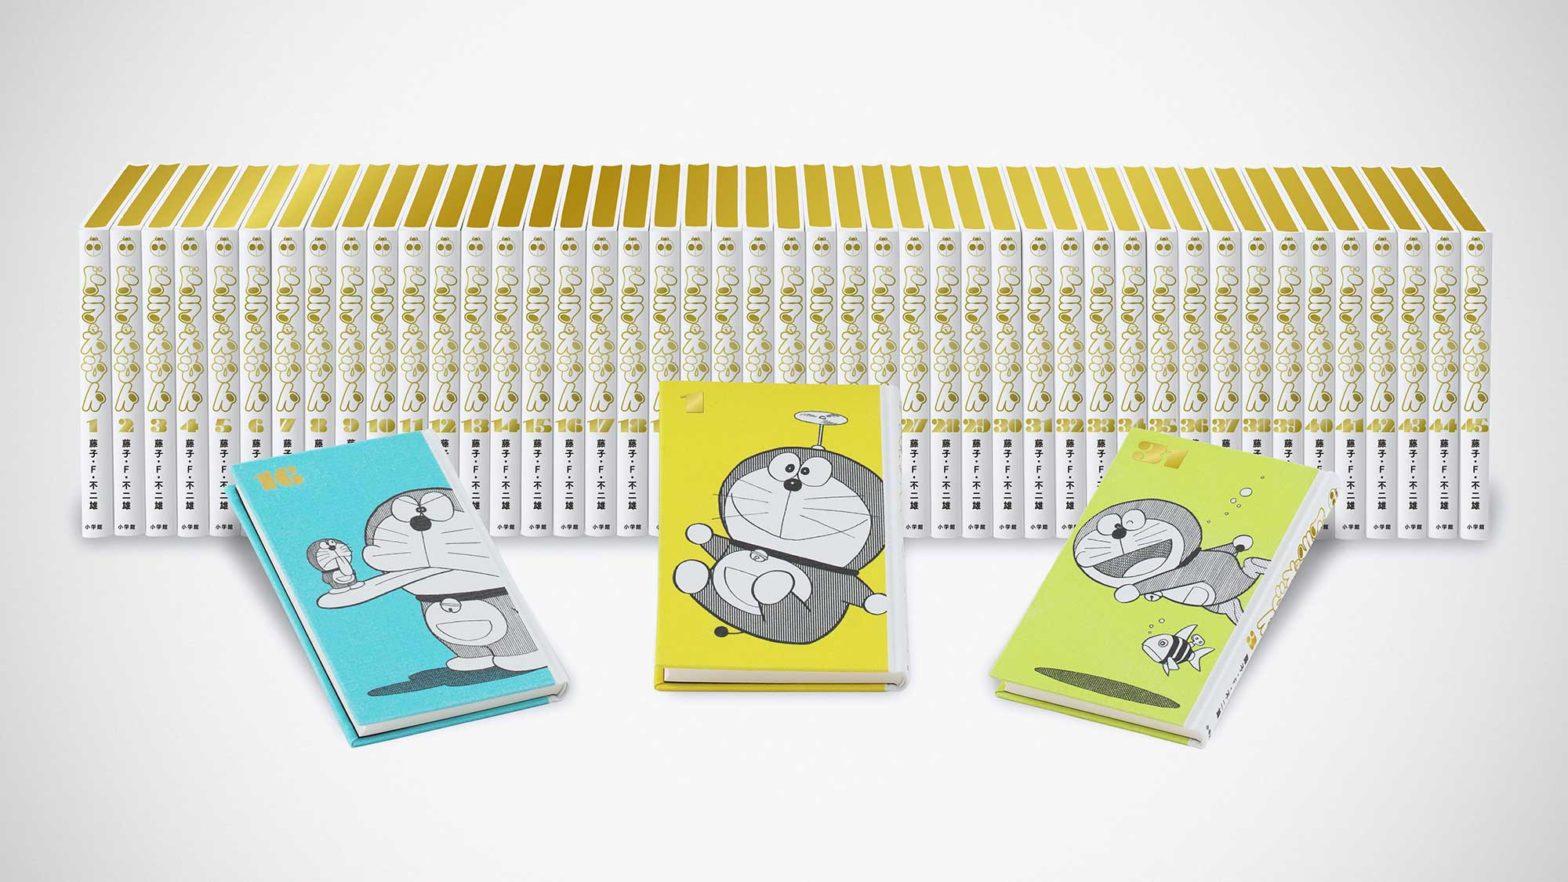 Doraemon Manga Set Collector's Edition